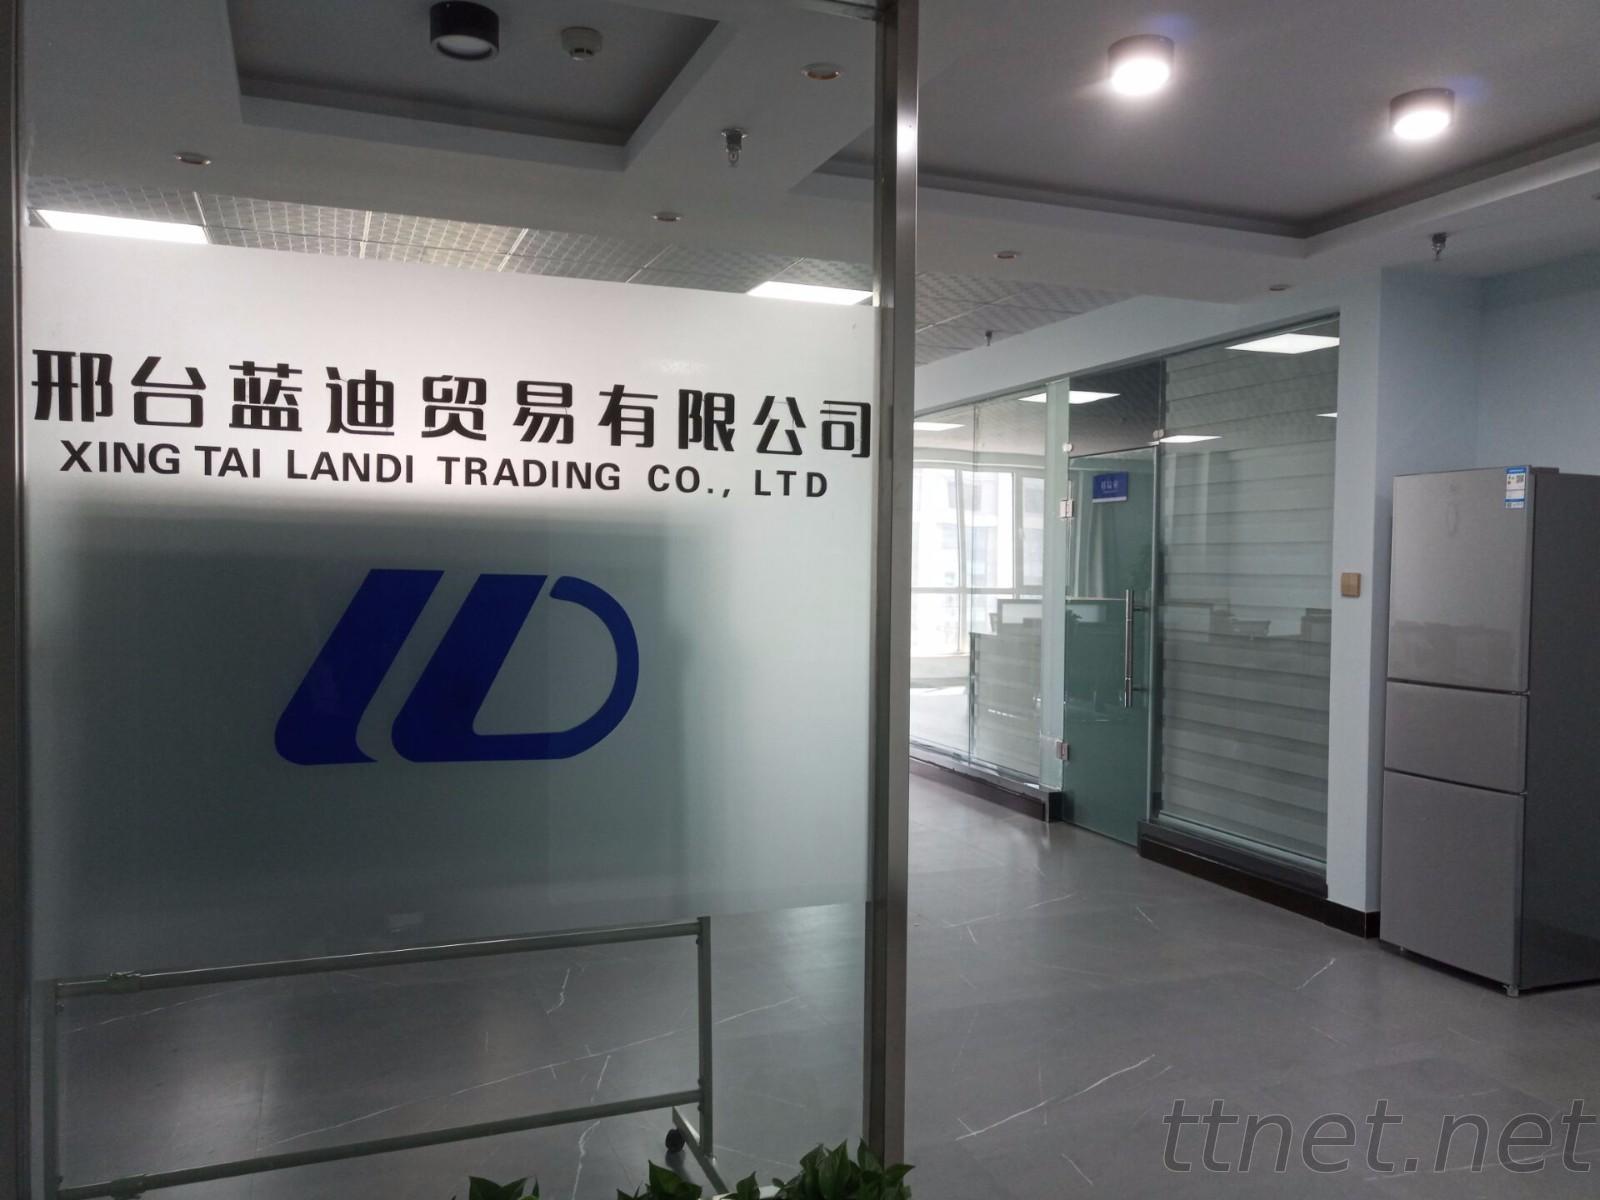 Xingtai Landi Trading Co., Ltd.